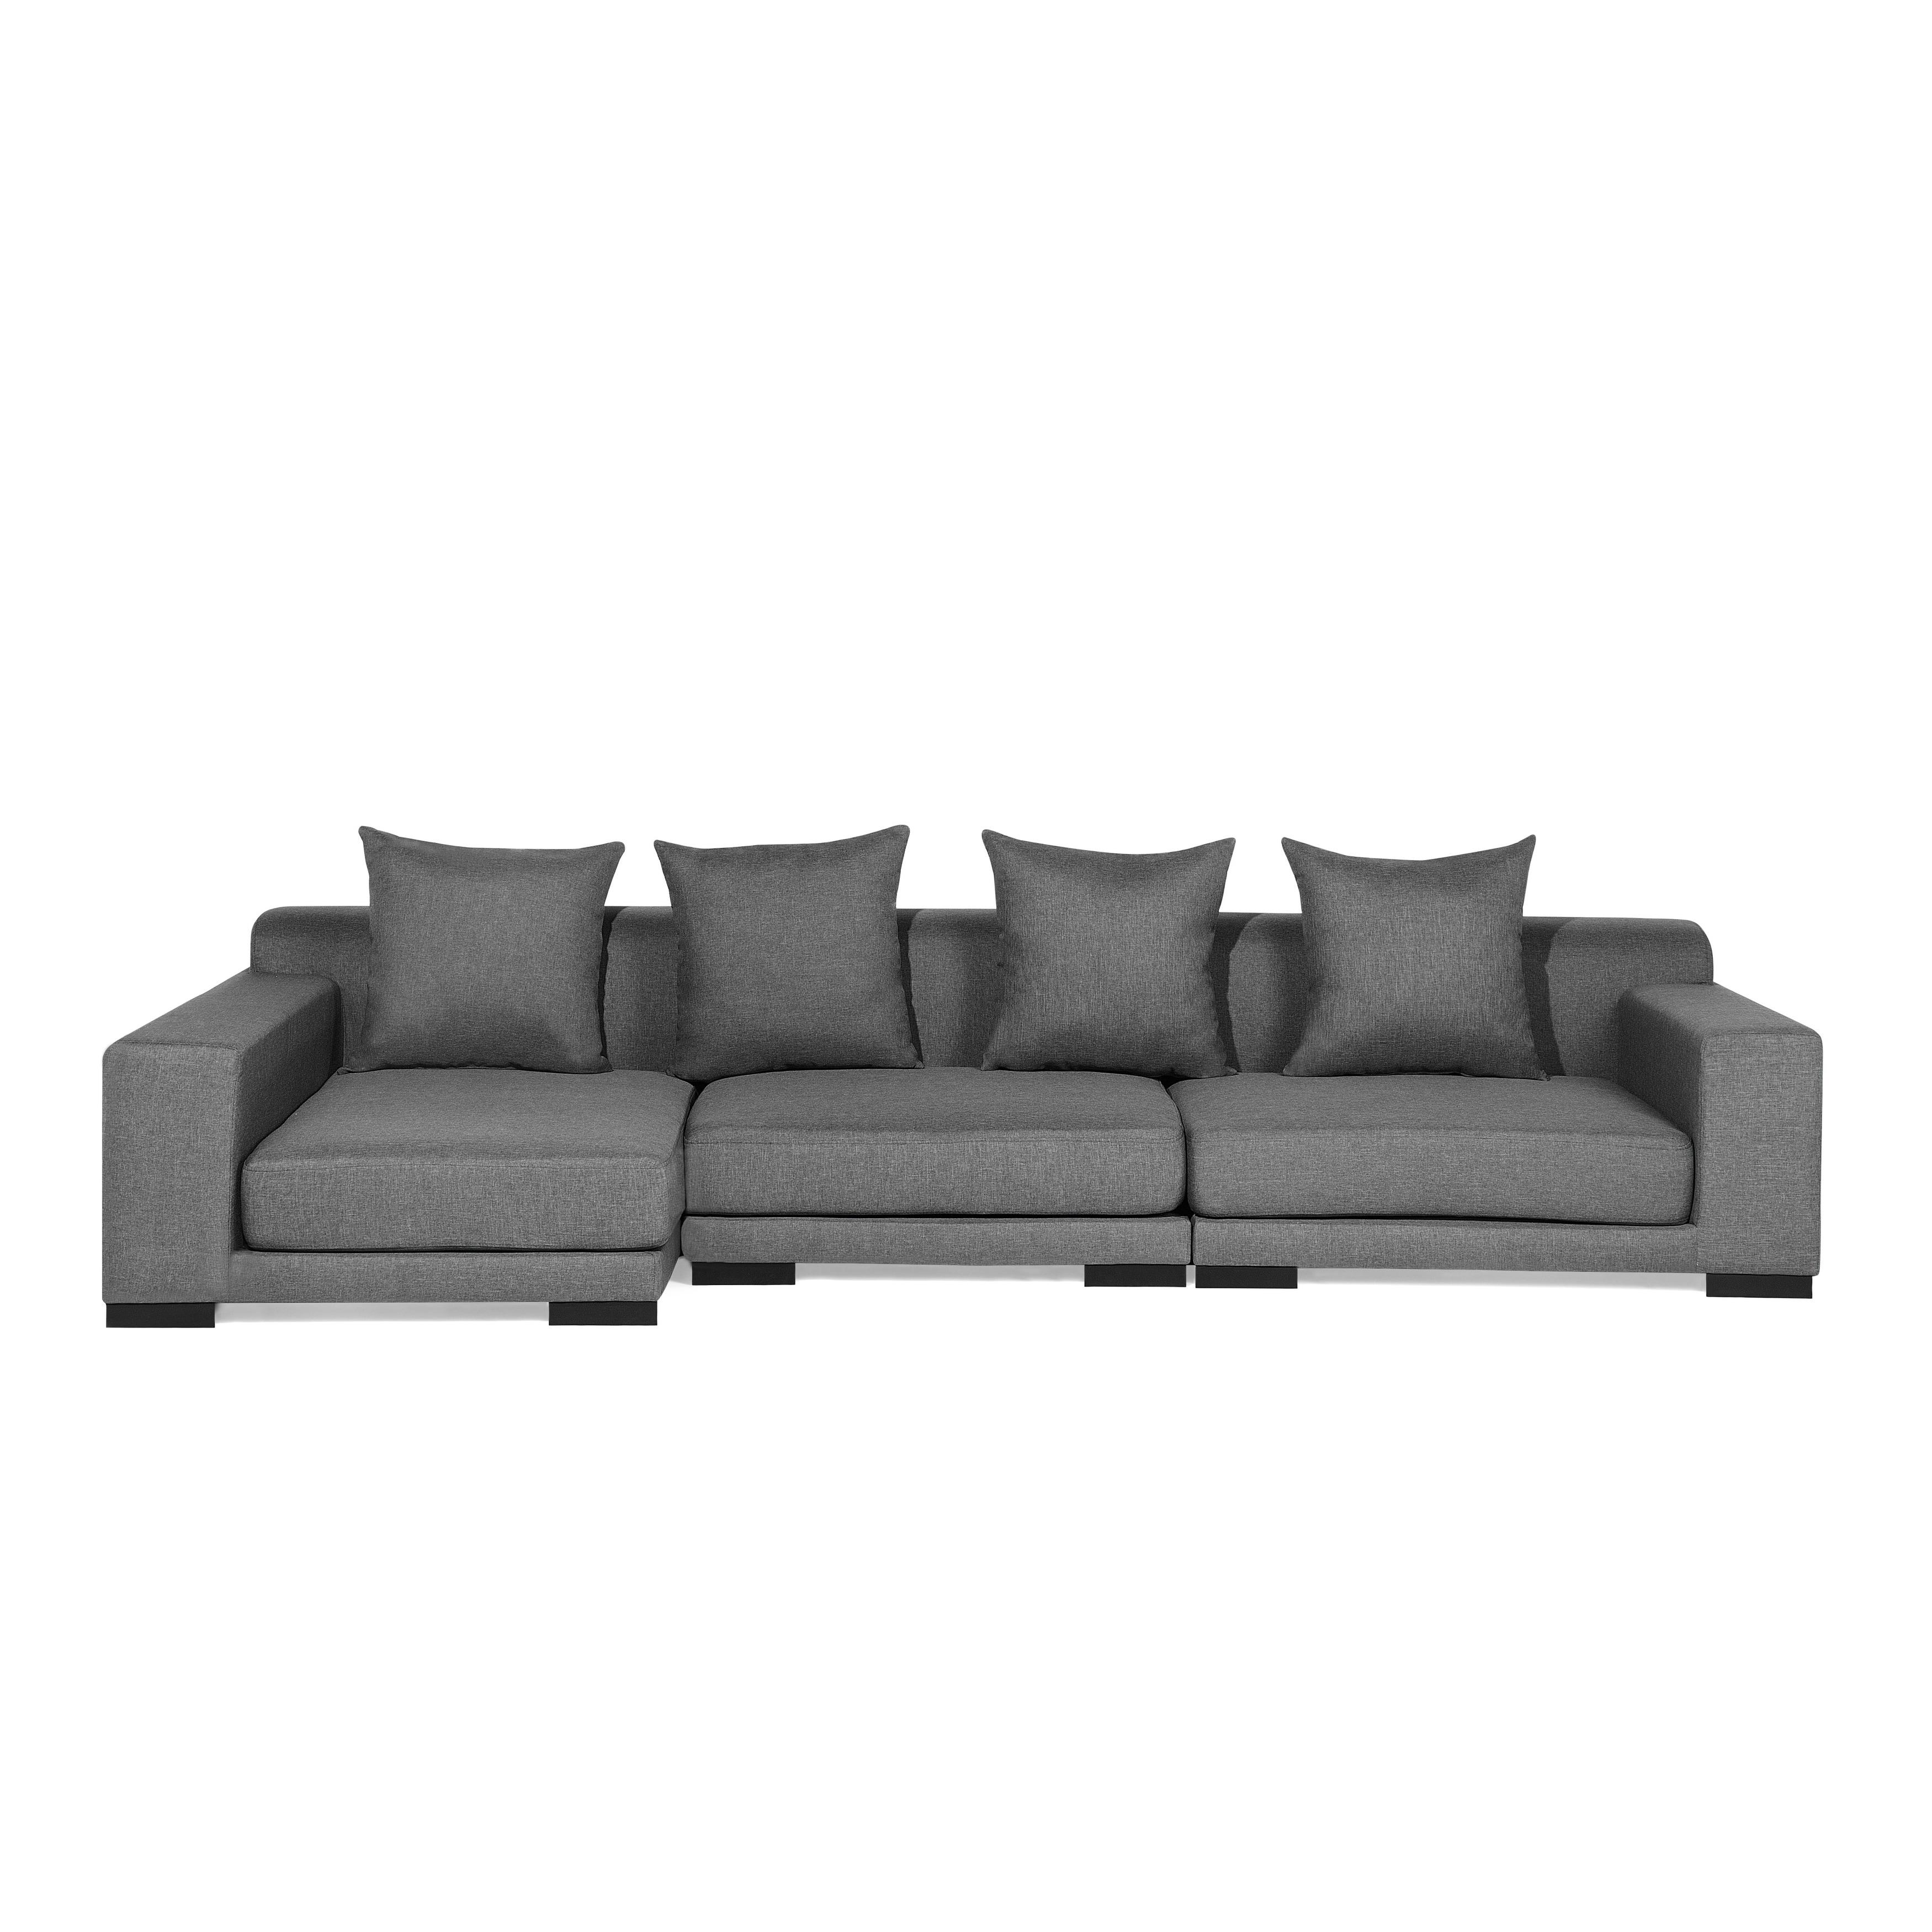 Shop Modular Sectional Sofa   Gray Fabric R CLOUD   Free Shipping Today    Overstock.com   19220433